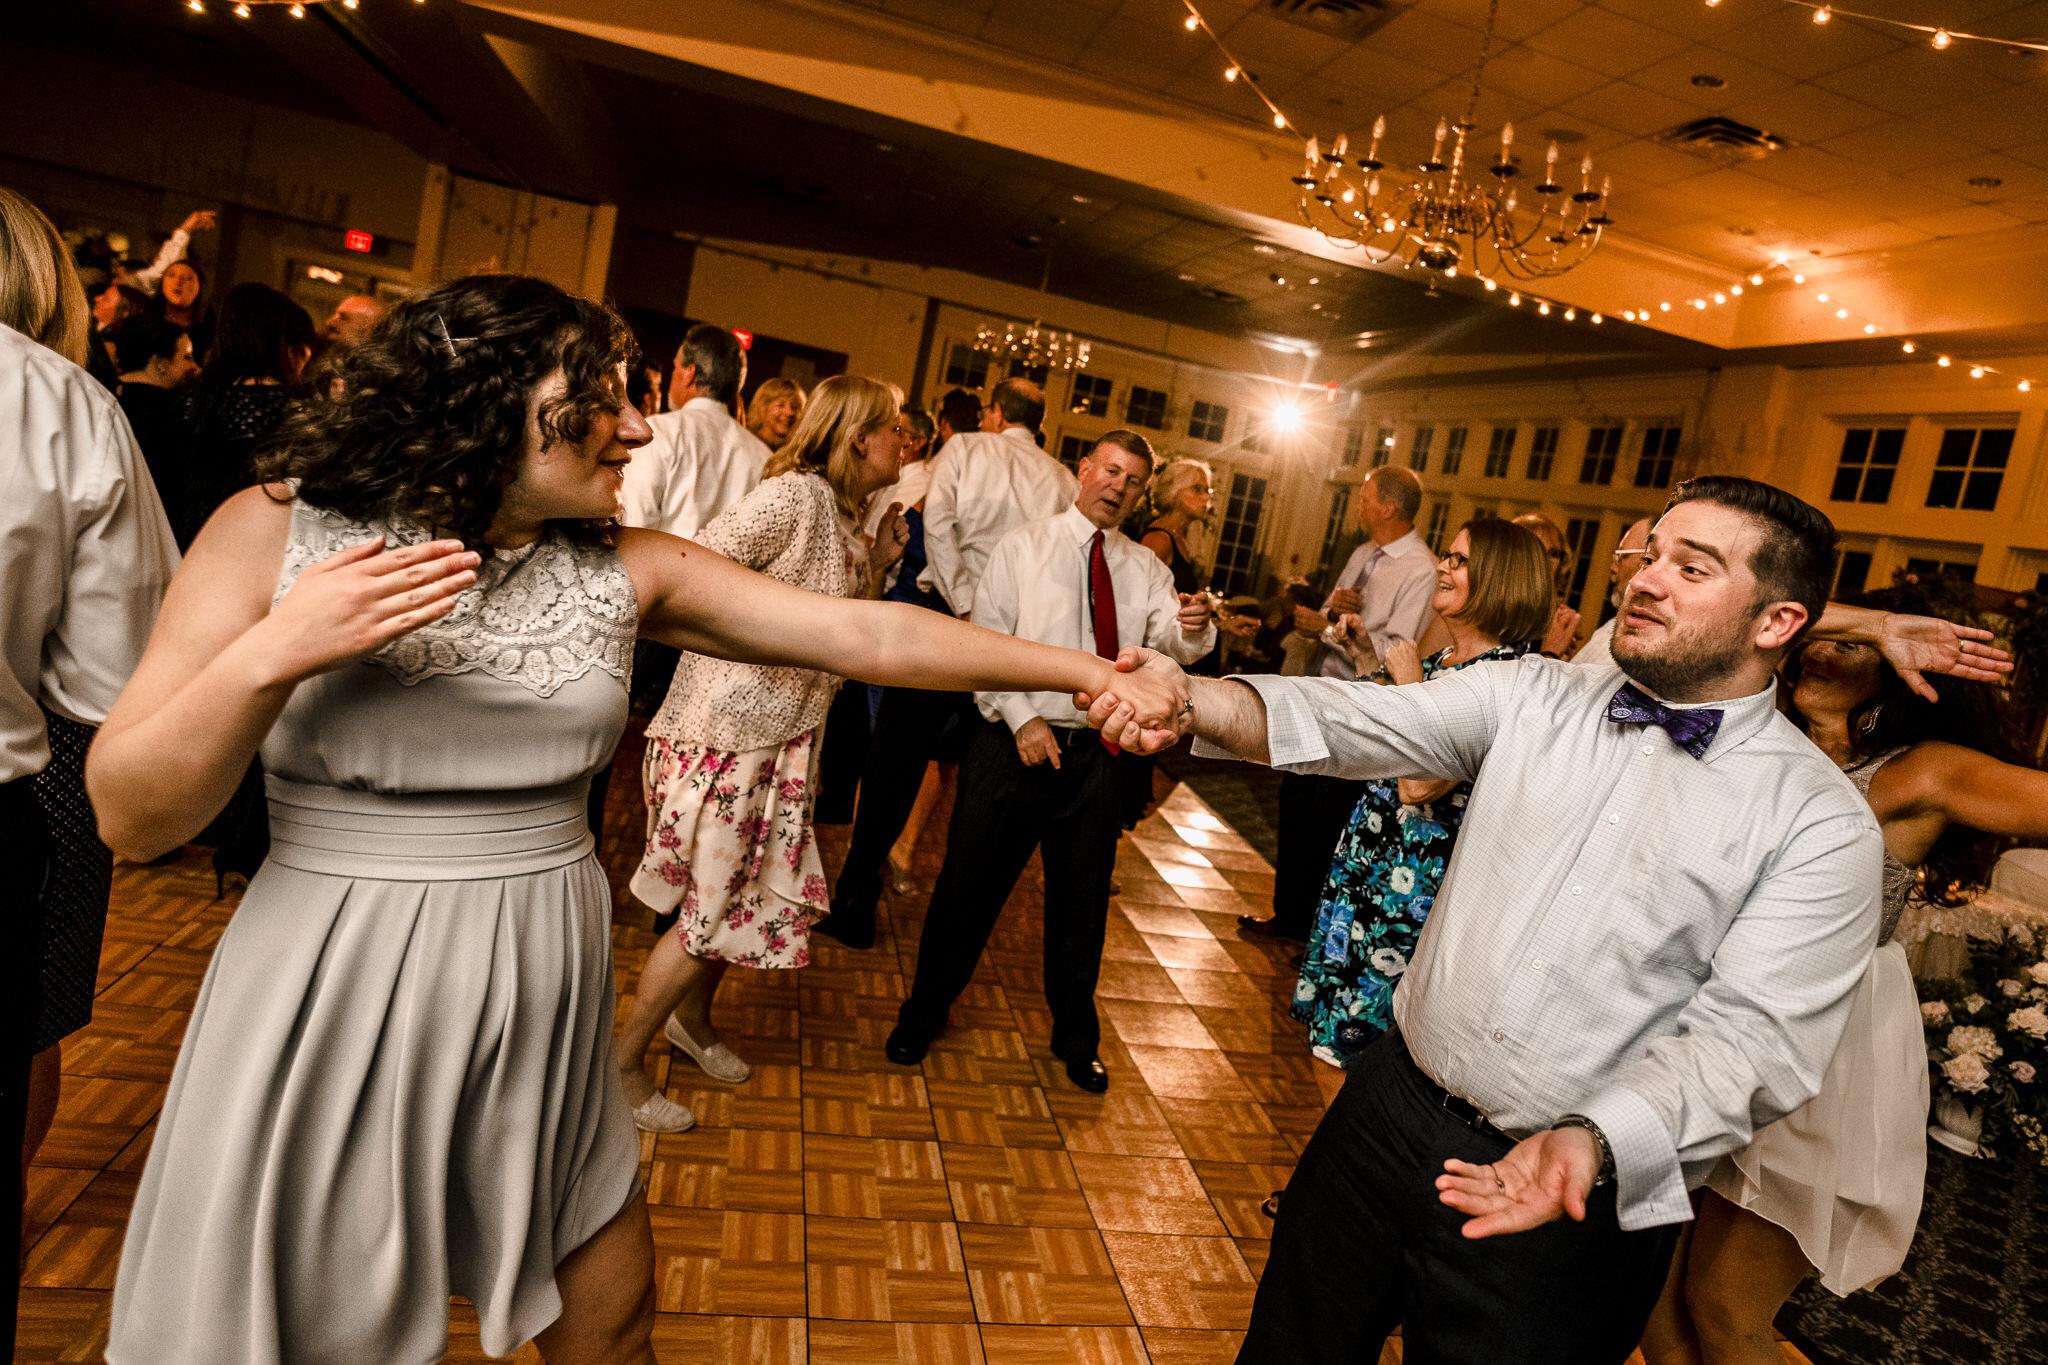 Coyle-Forsgate-Country-Club-Wedding-Photographer-54.JPG